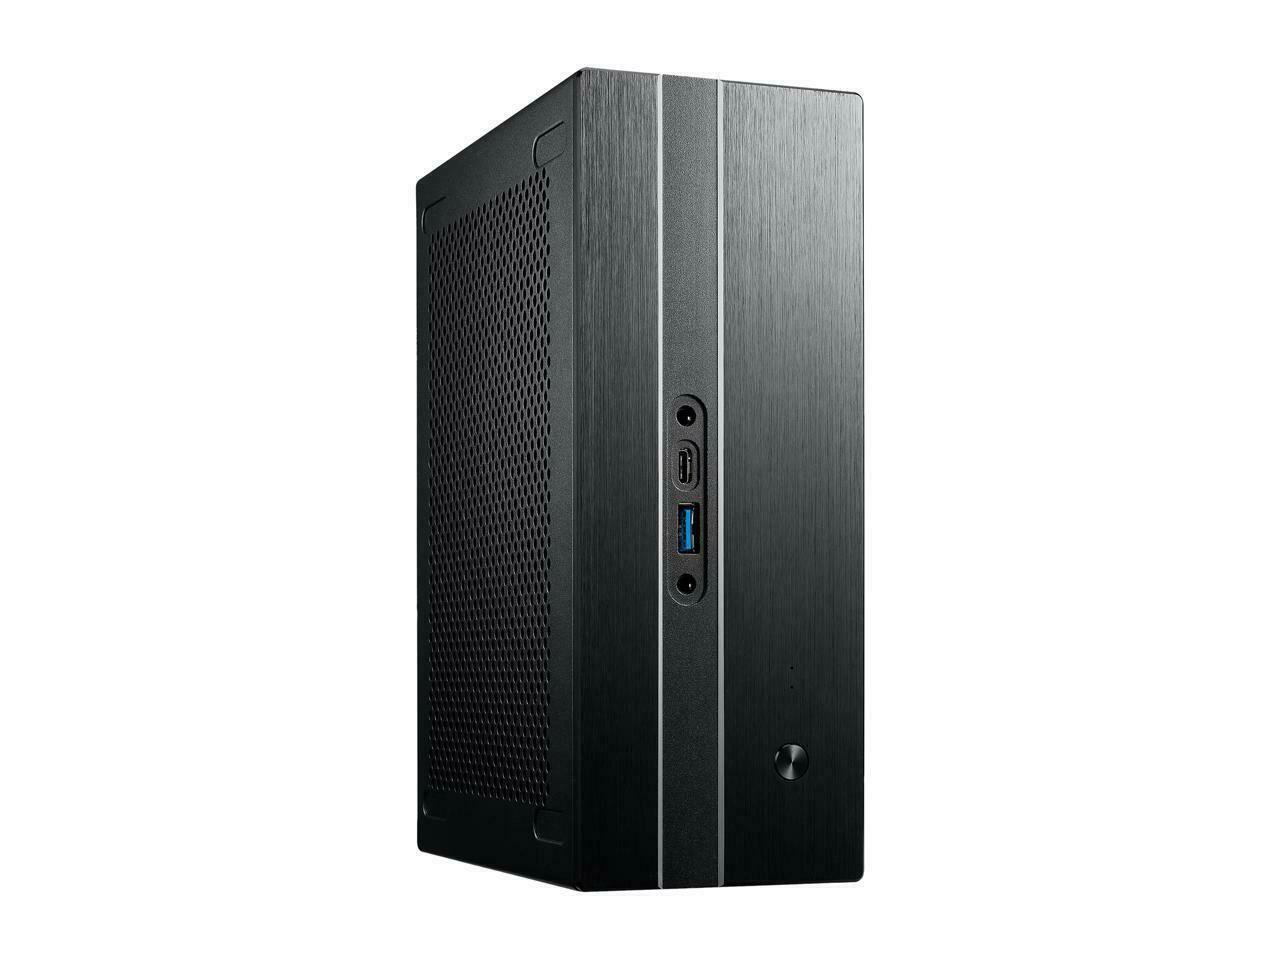 ASRock DESKMINI 6GB Core i7-7700T, 512GB